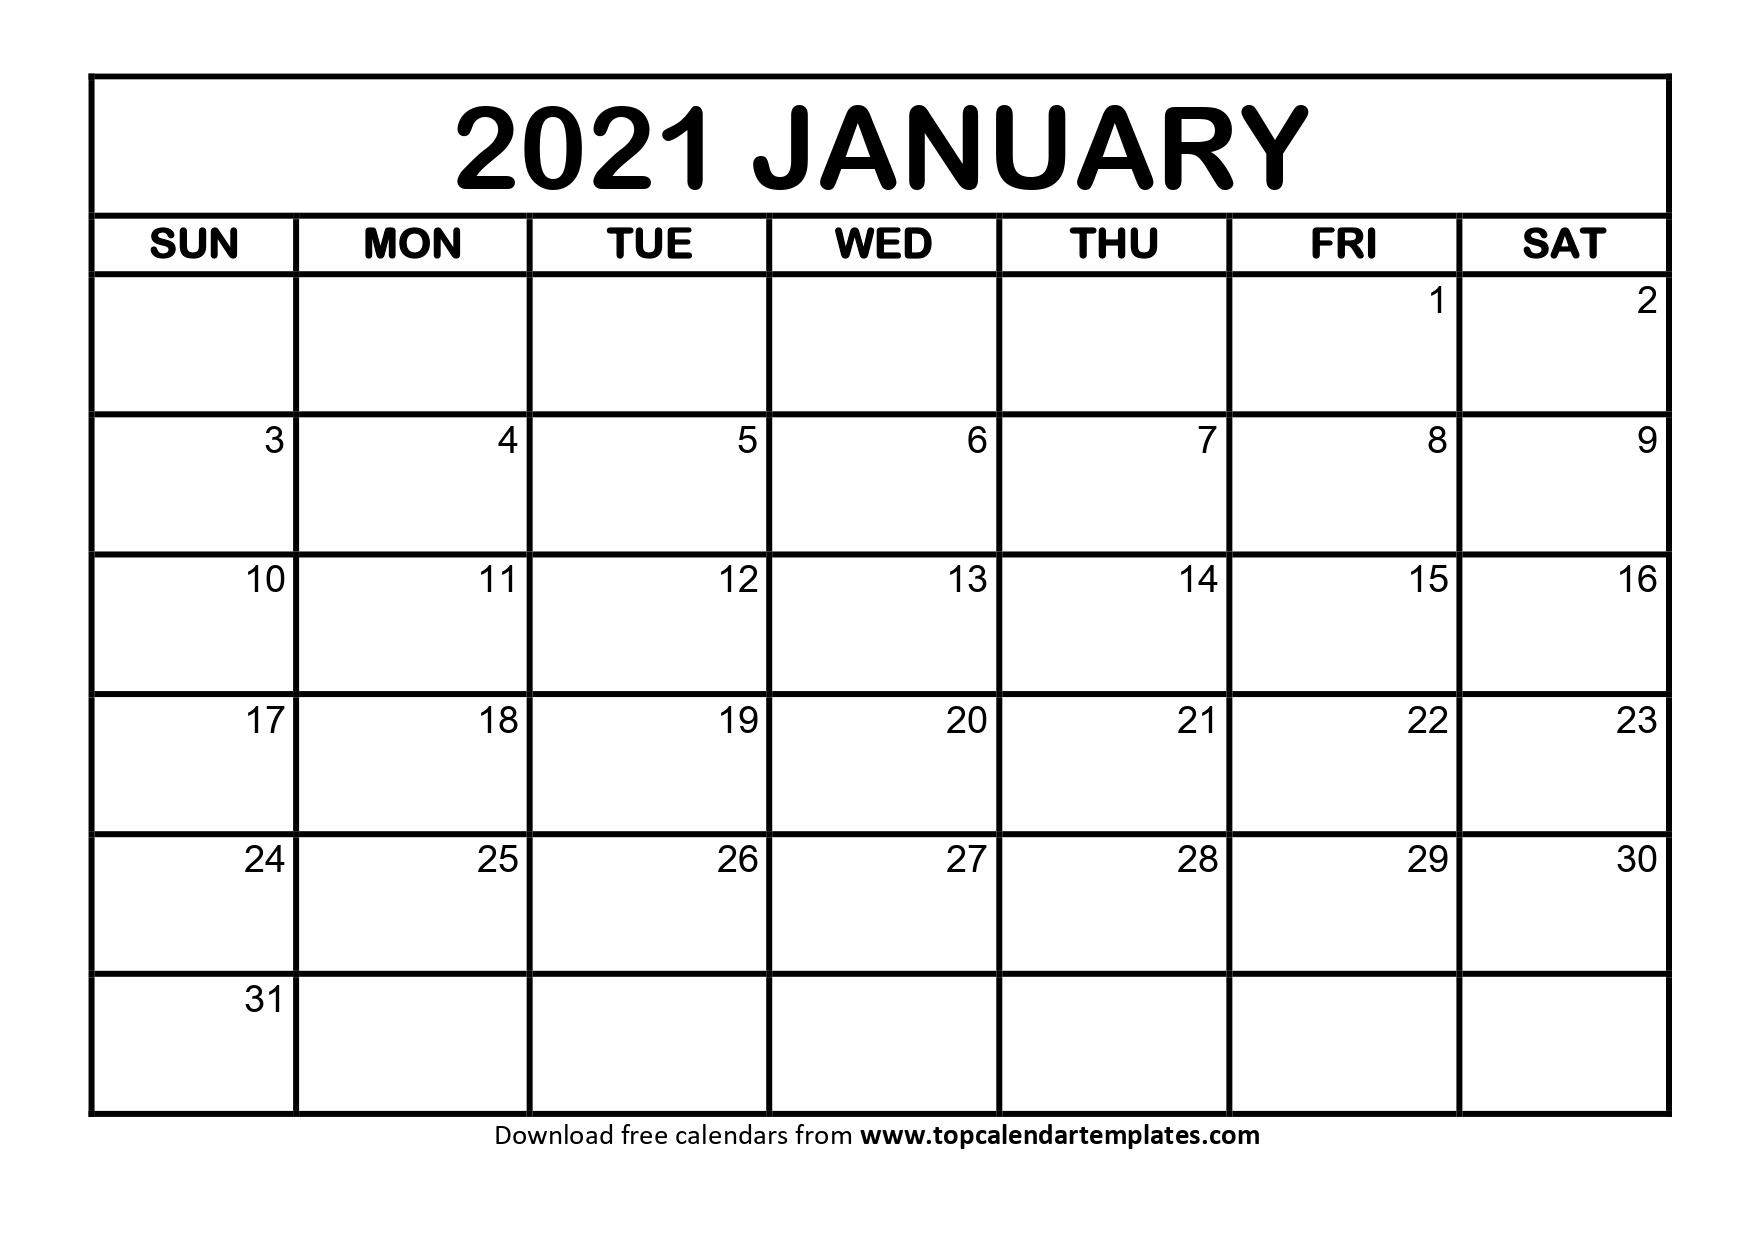 Printable January 2021 Calendar Template - Download Now